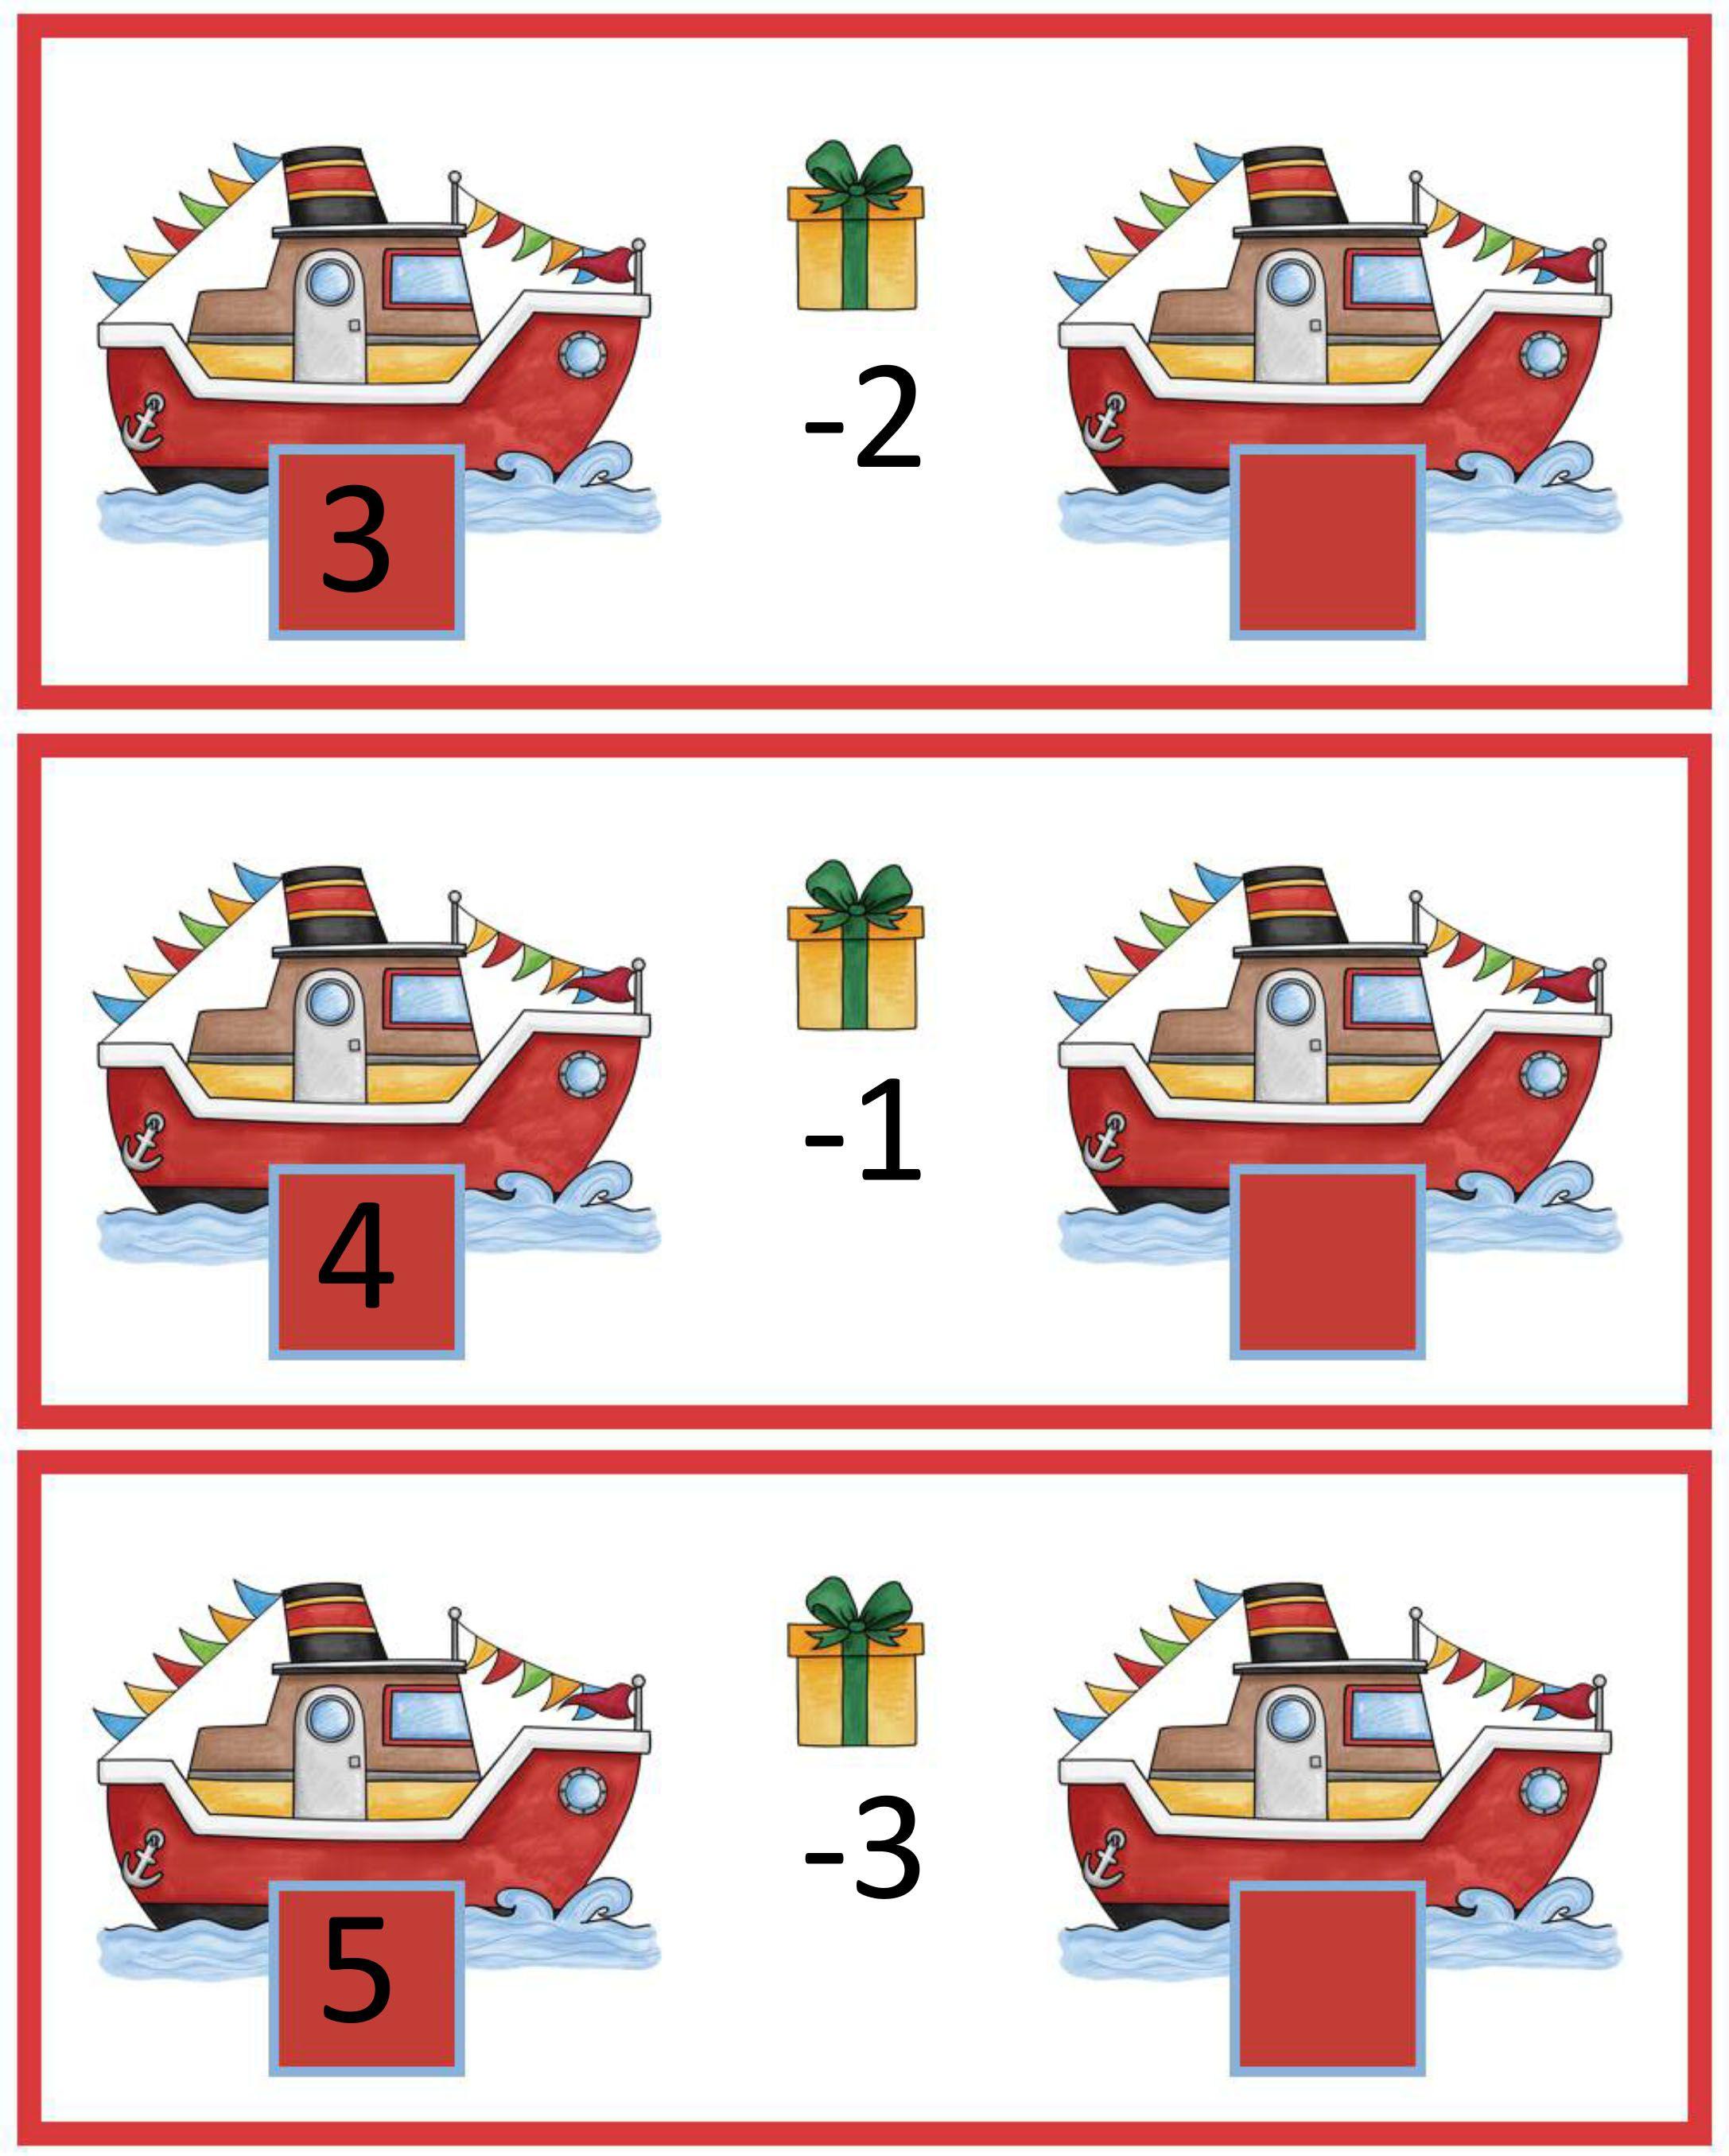 Thema Sinterklaas | Klas van juf Linda #themasinterklaas